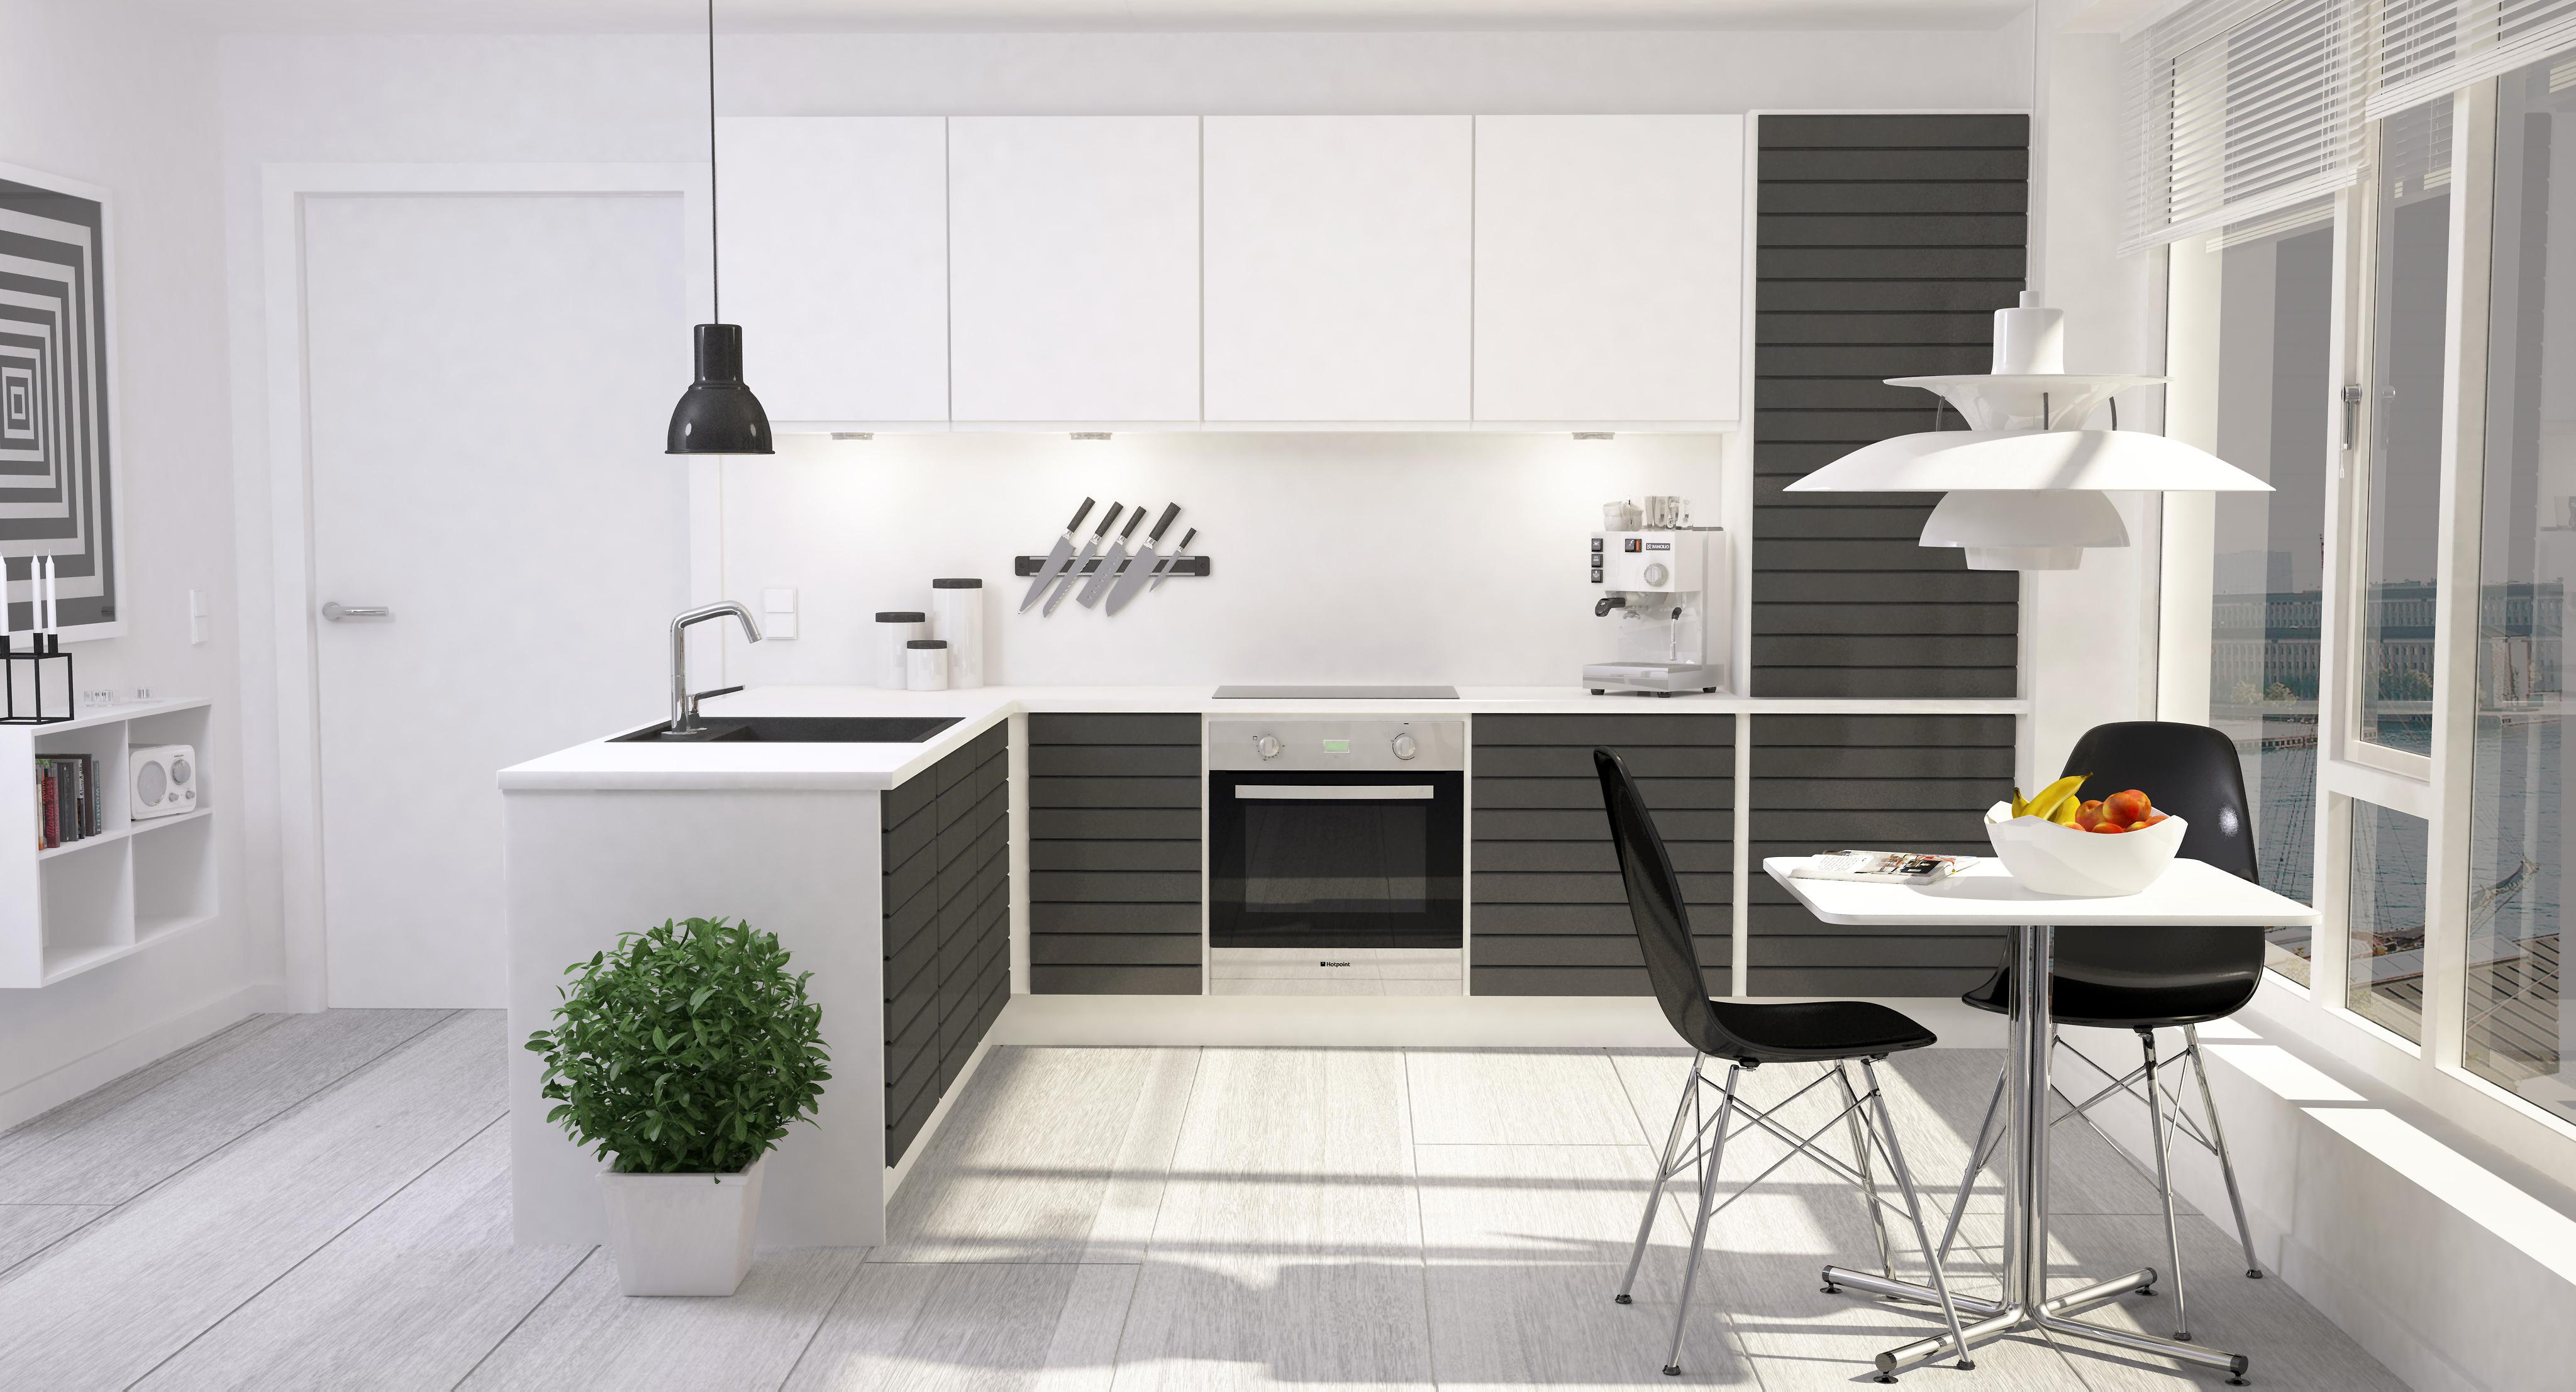 modern kitchen interior 001 3d model max obj fbx dxf